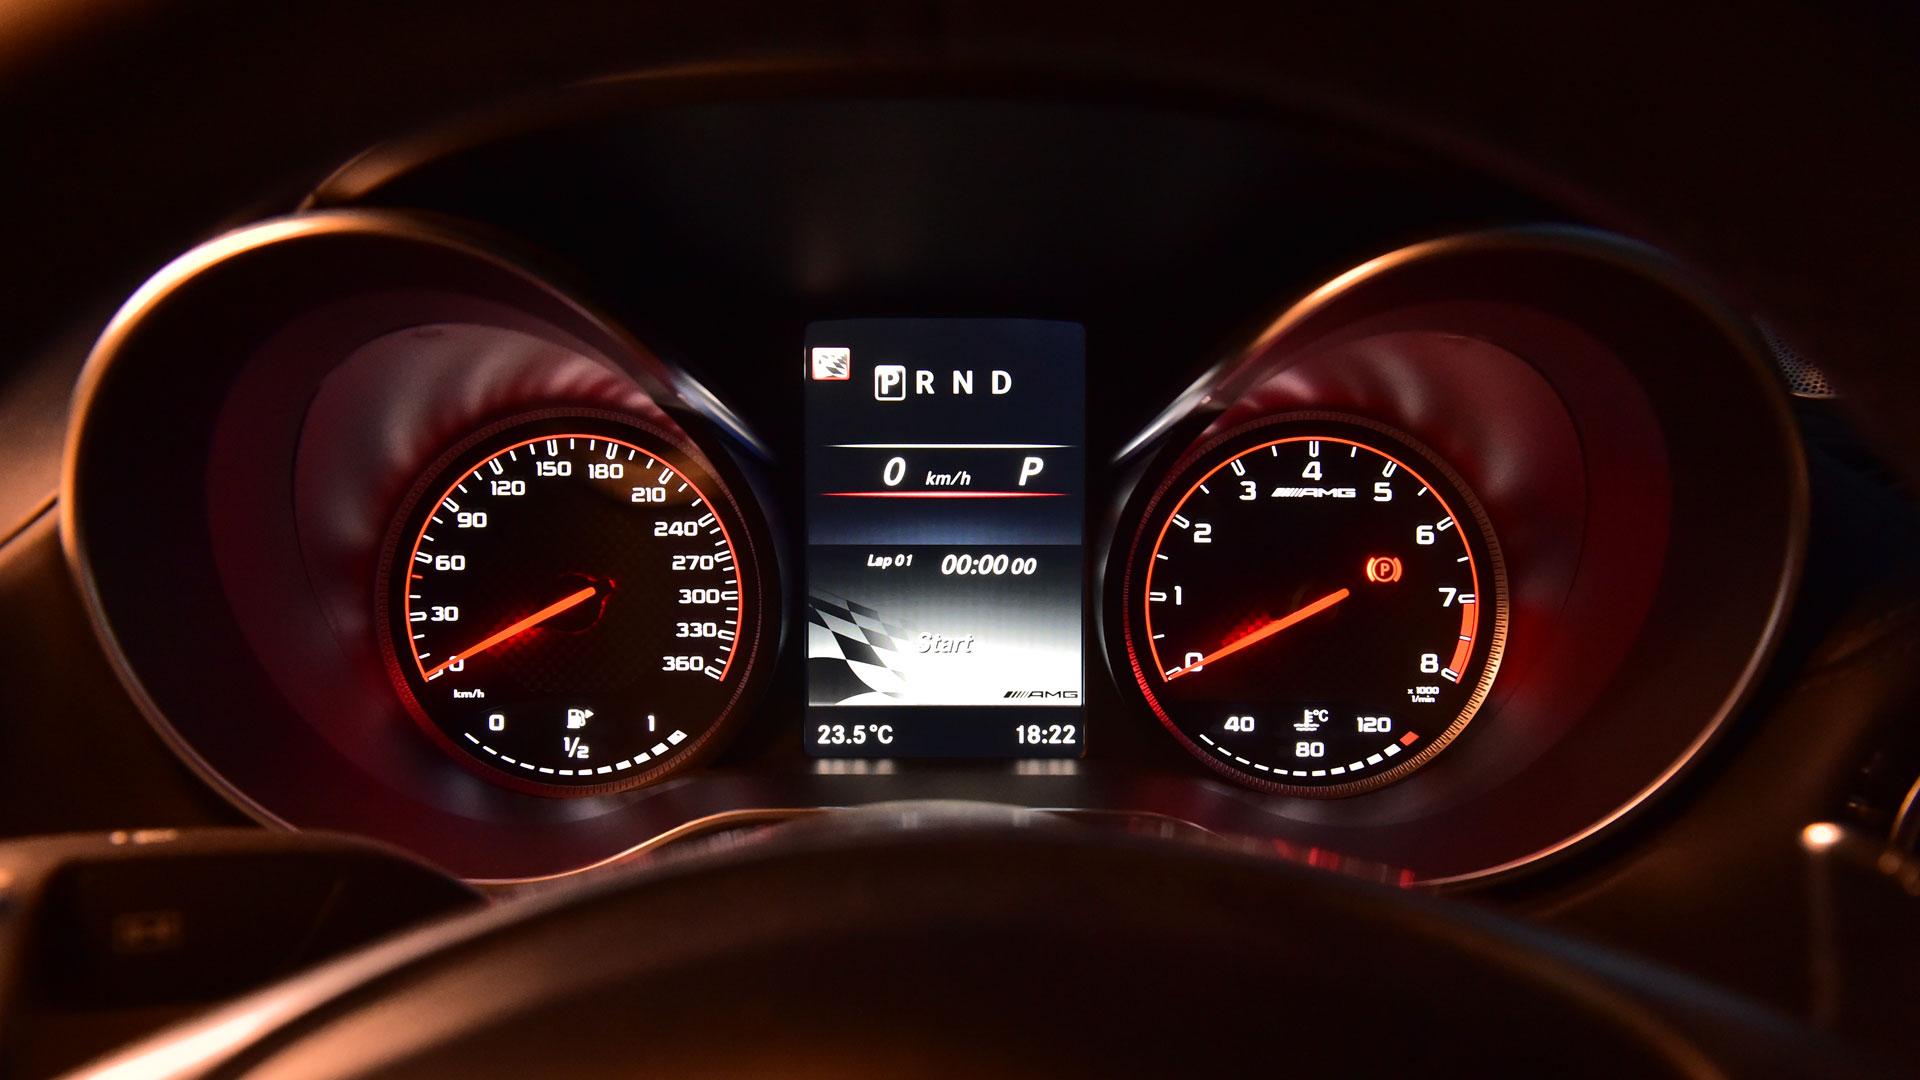 Mercedes benz AMG GT 2015 S Interior